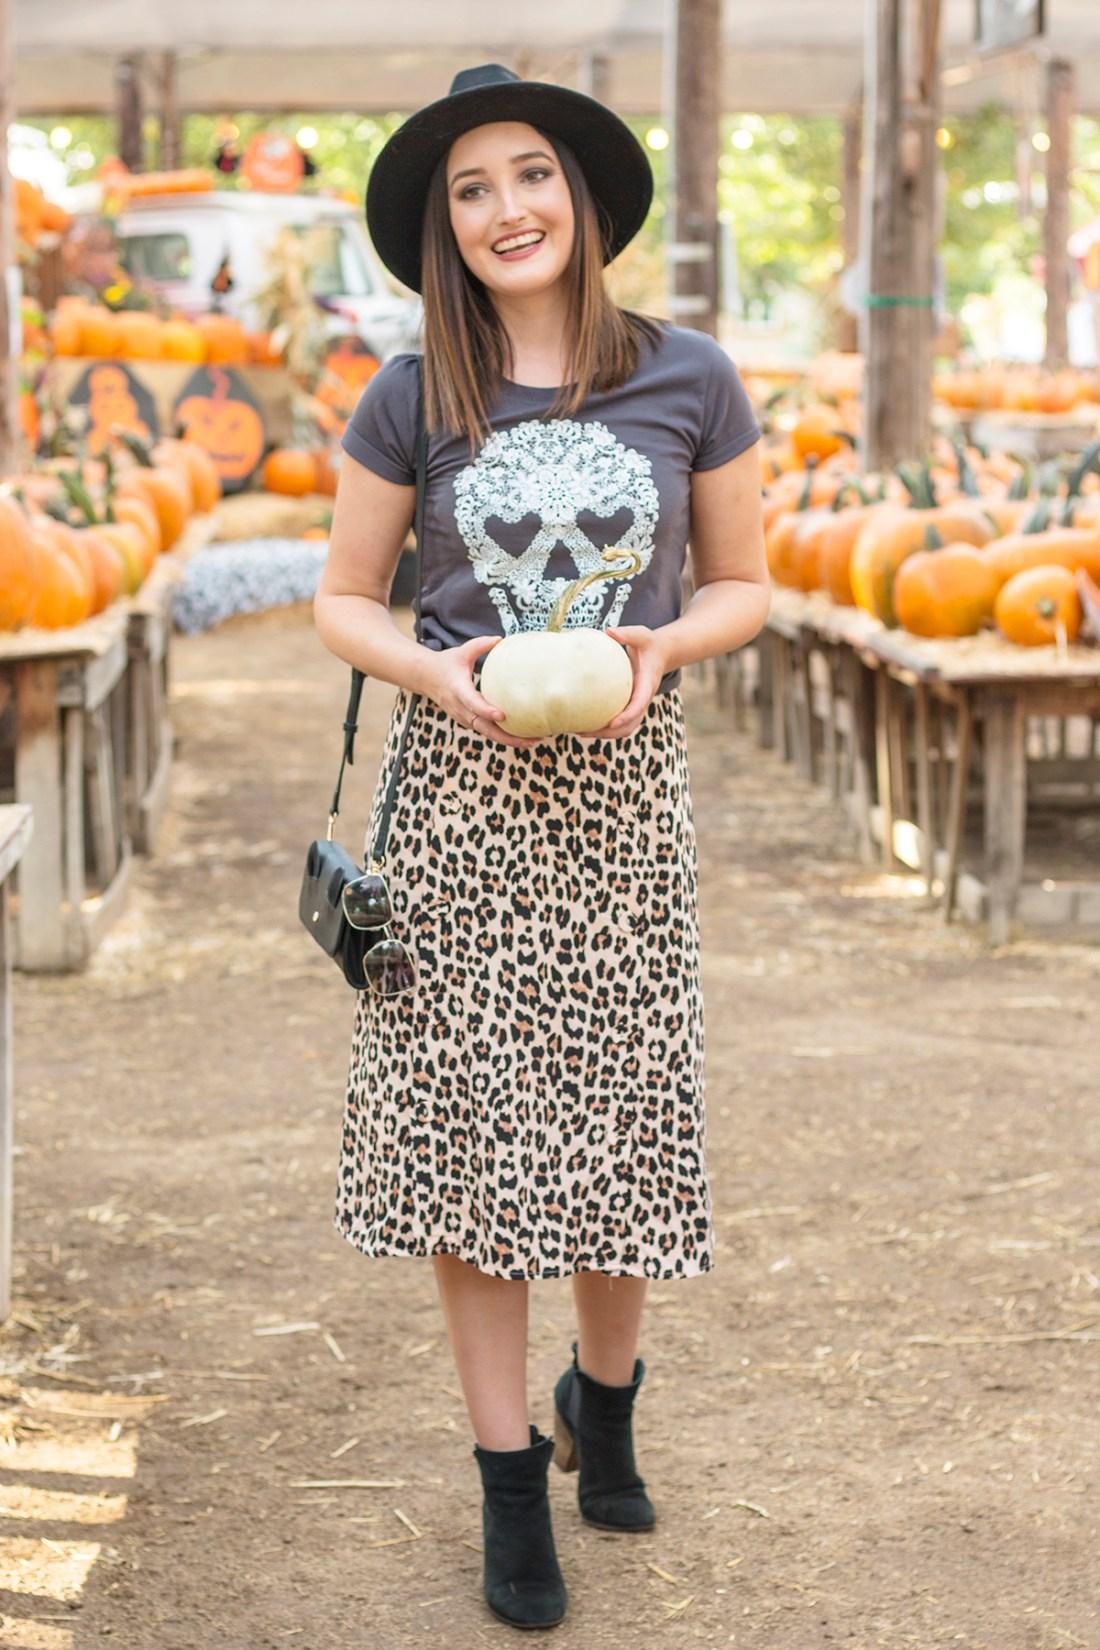 Fall Style: Graphic Tee & Leopard Midi Skirt | A Good Hue